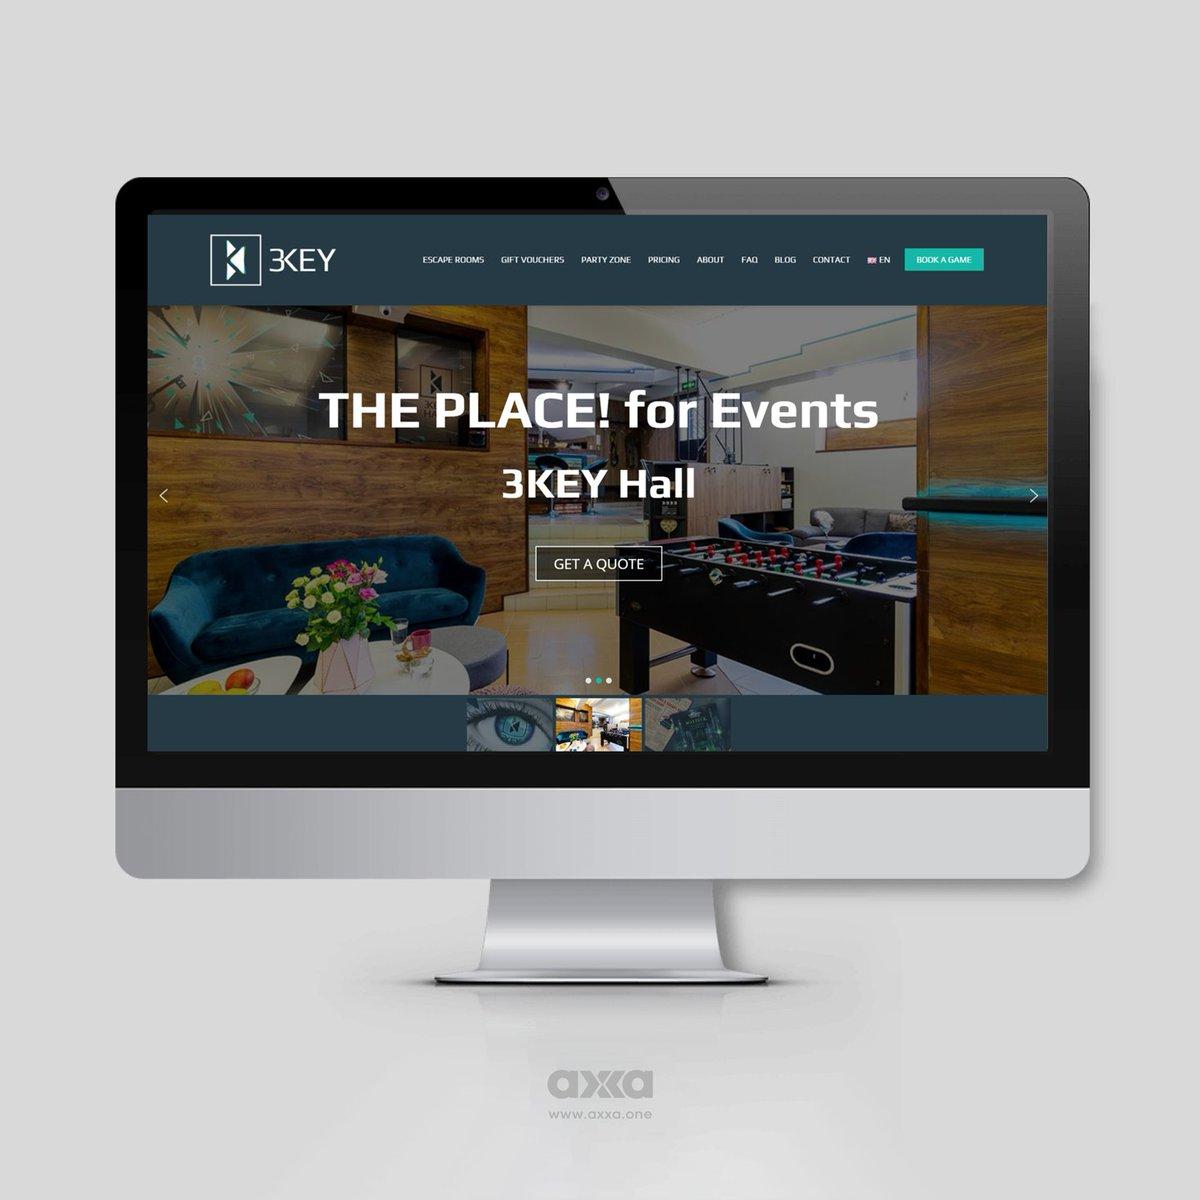 #3KEY #website #redesign #homepage – #desktop version in English.  #axxastudio #whyaxxa #axxawebdesign #webdesign #webdesigner #landingpage #newwebsite #pagedesign #uxdesign #homepage #ui #ux #customerexperience #webdevelopment #seo #onpageseo #webspeed #sslcertificate #wordpresspic.twitter.com/uwly6QegzT